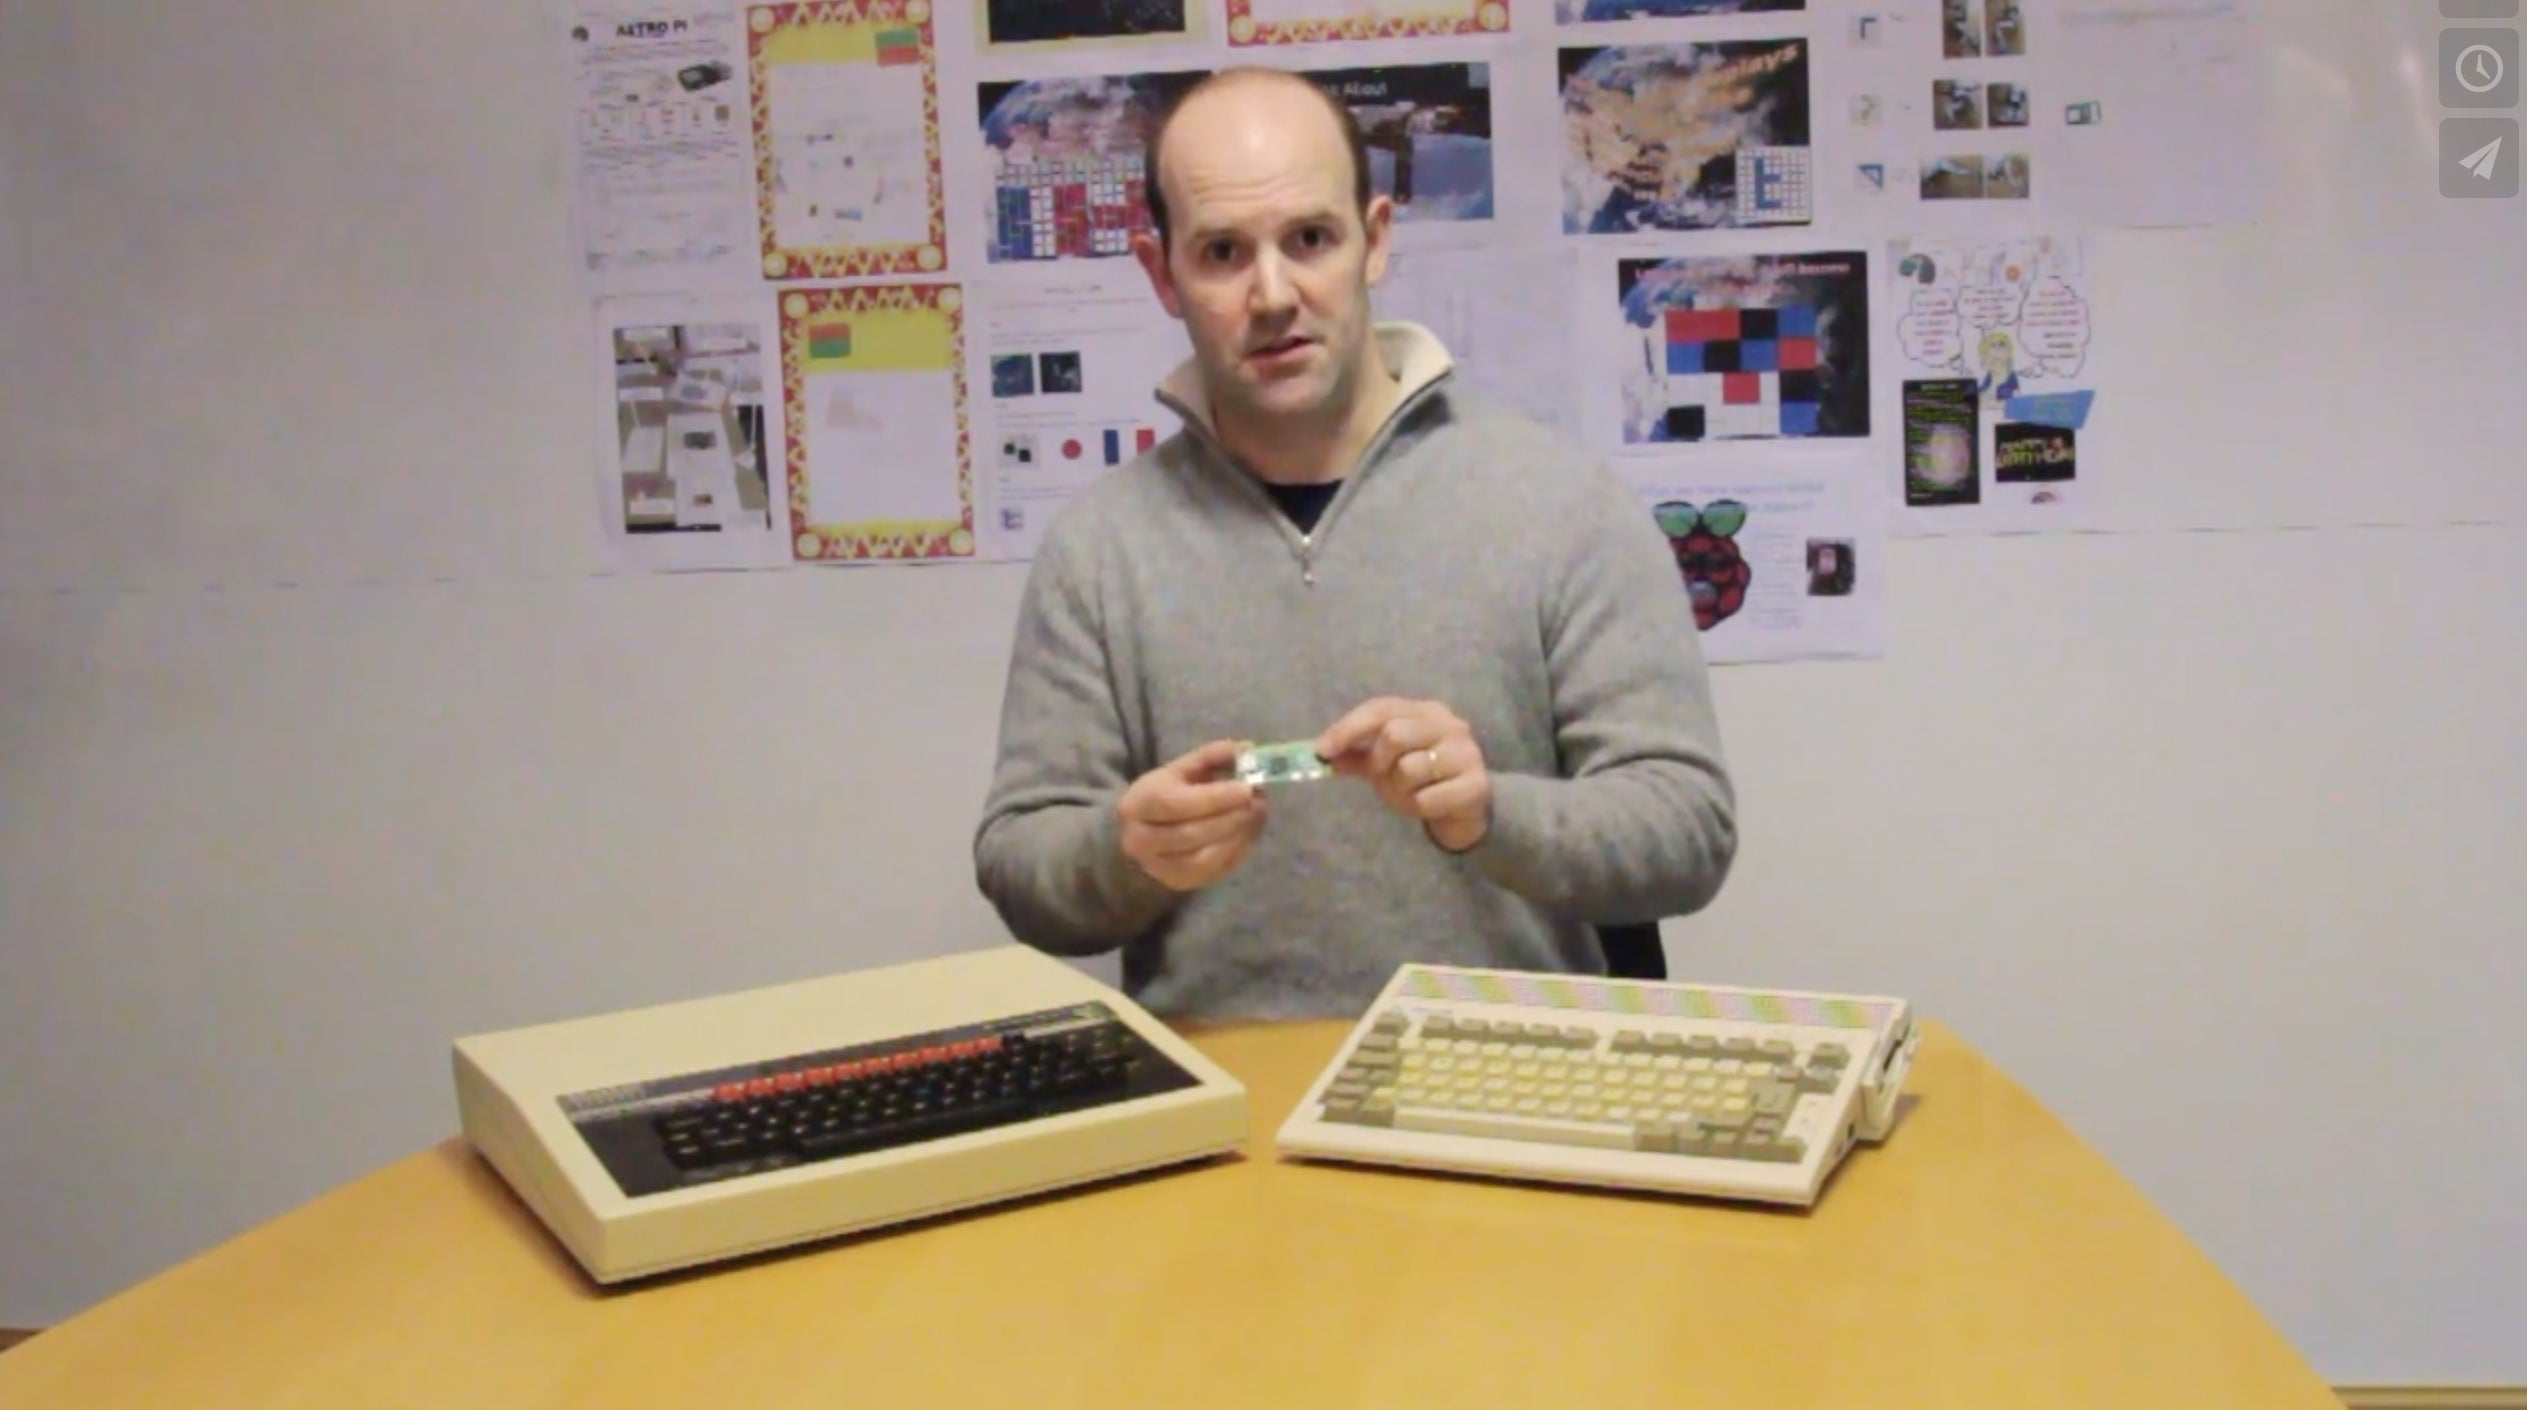 Raspberry pi zero a computer for 5 - Raspberry Pi Zero A Computer For 5 18